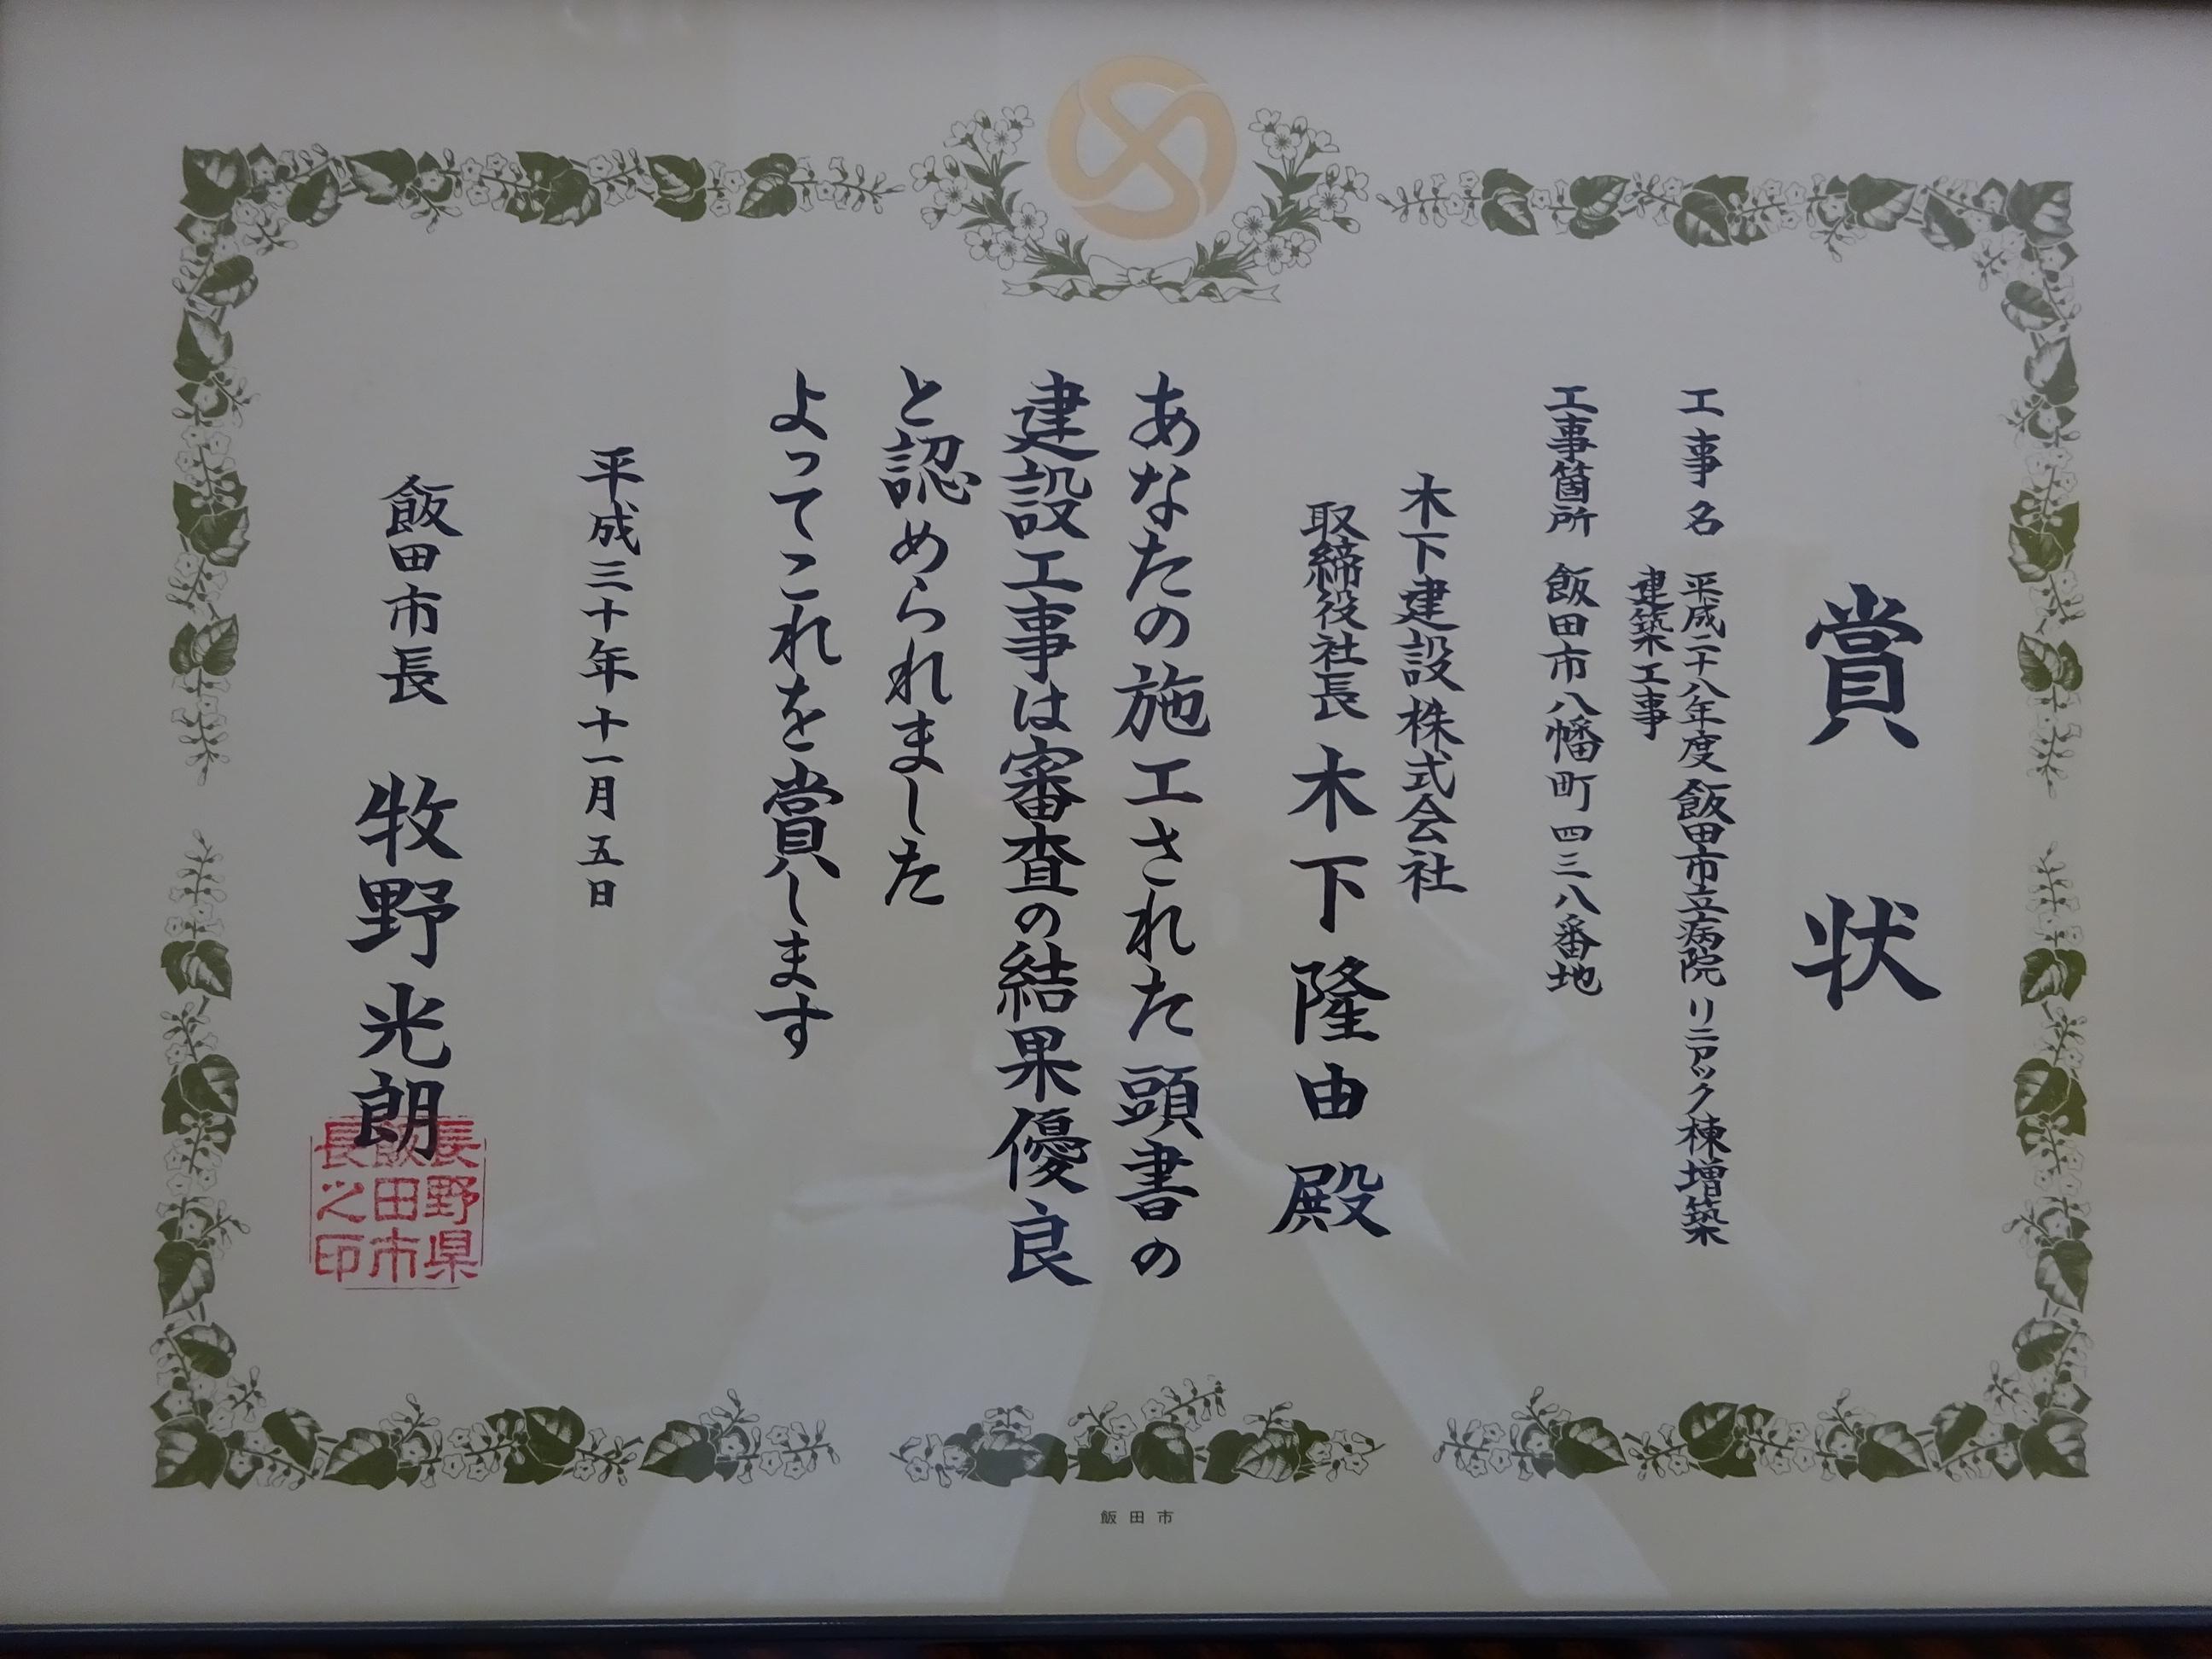 平成28年度 飯田市立病院リニアック棟増築建築工事